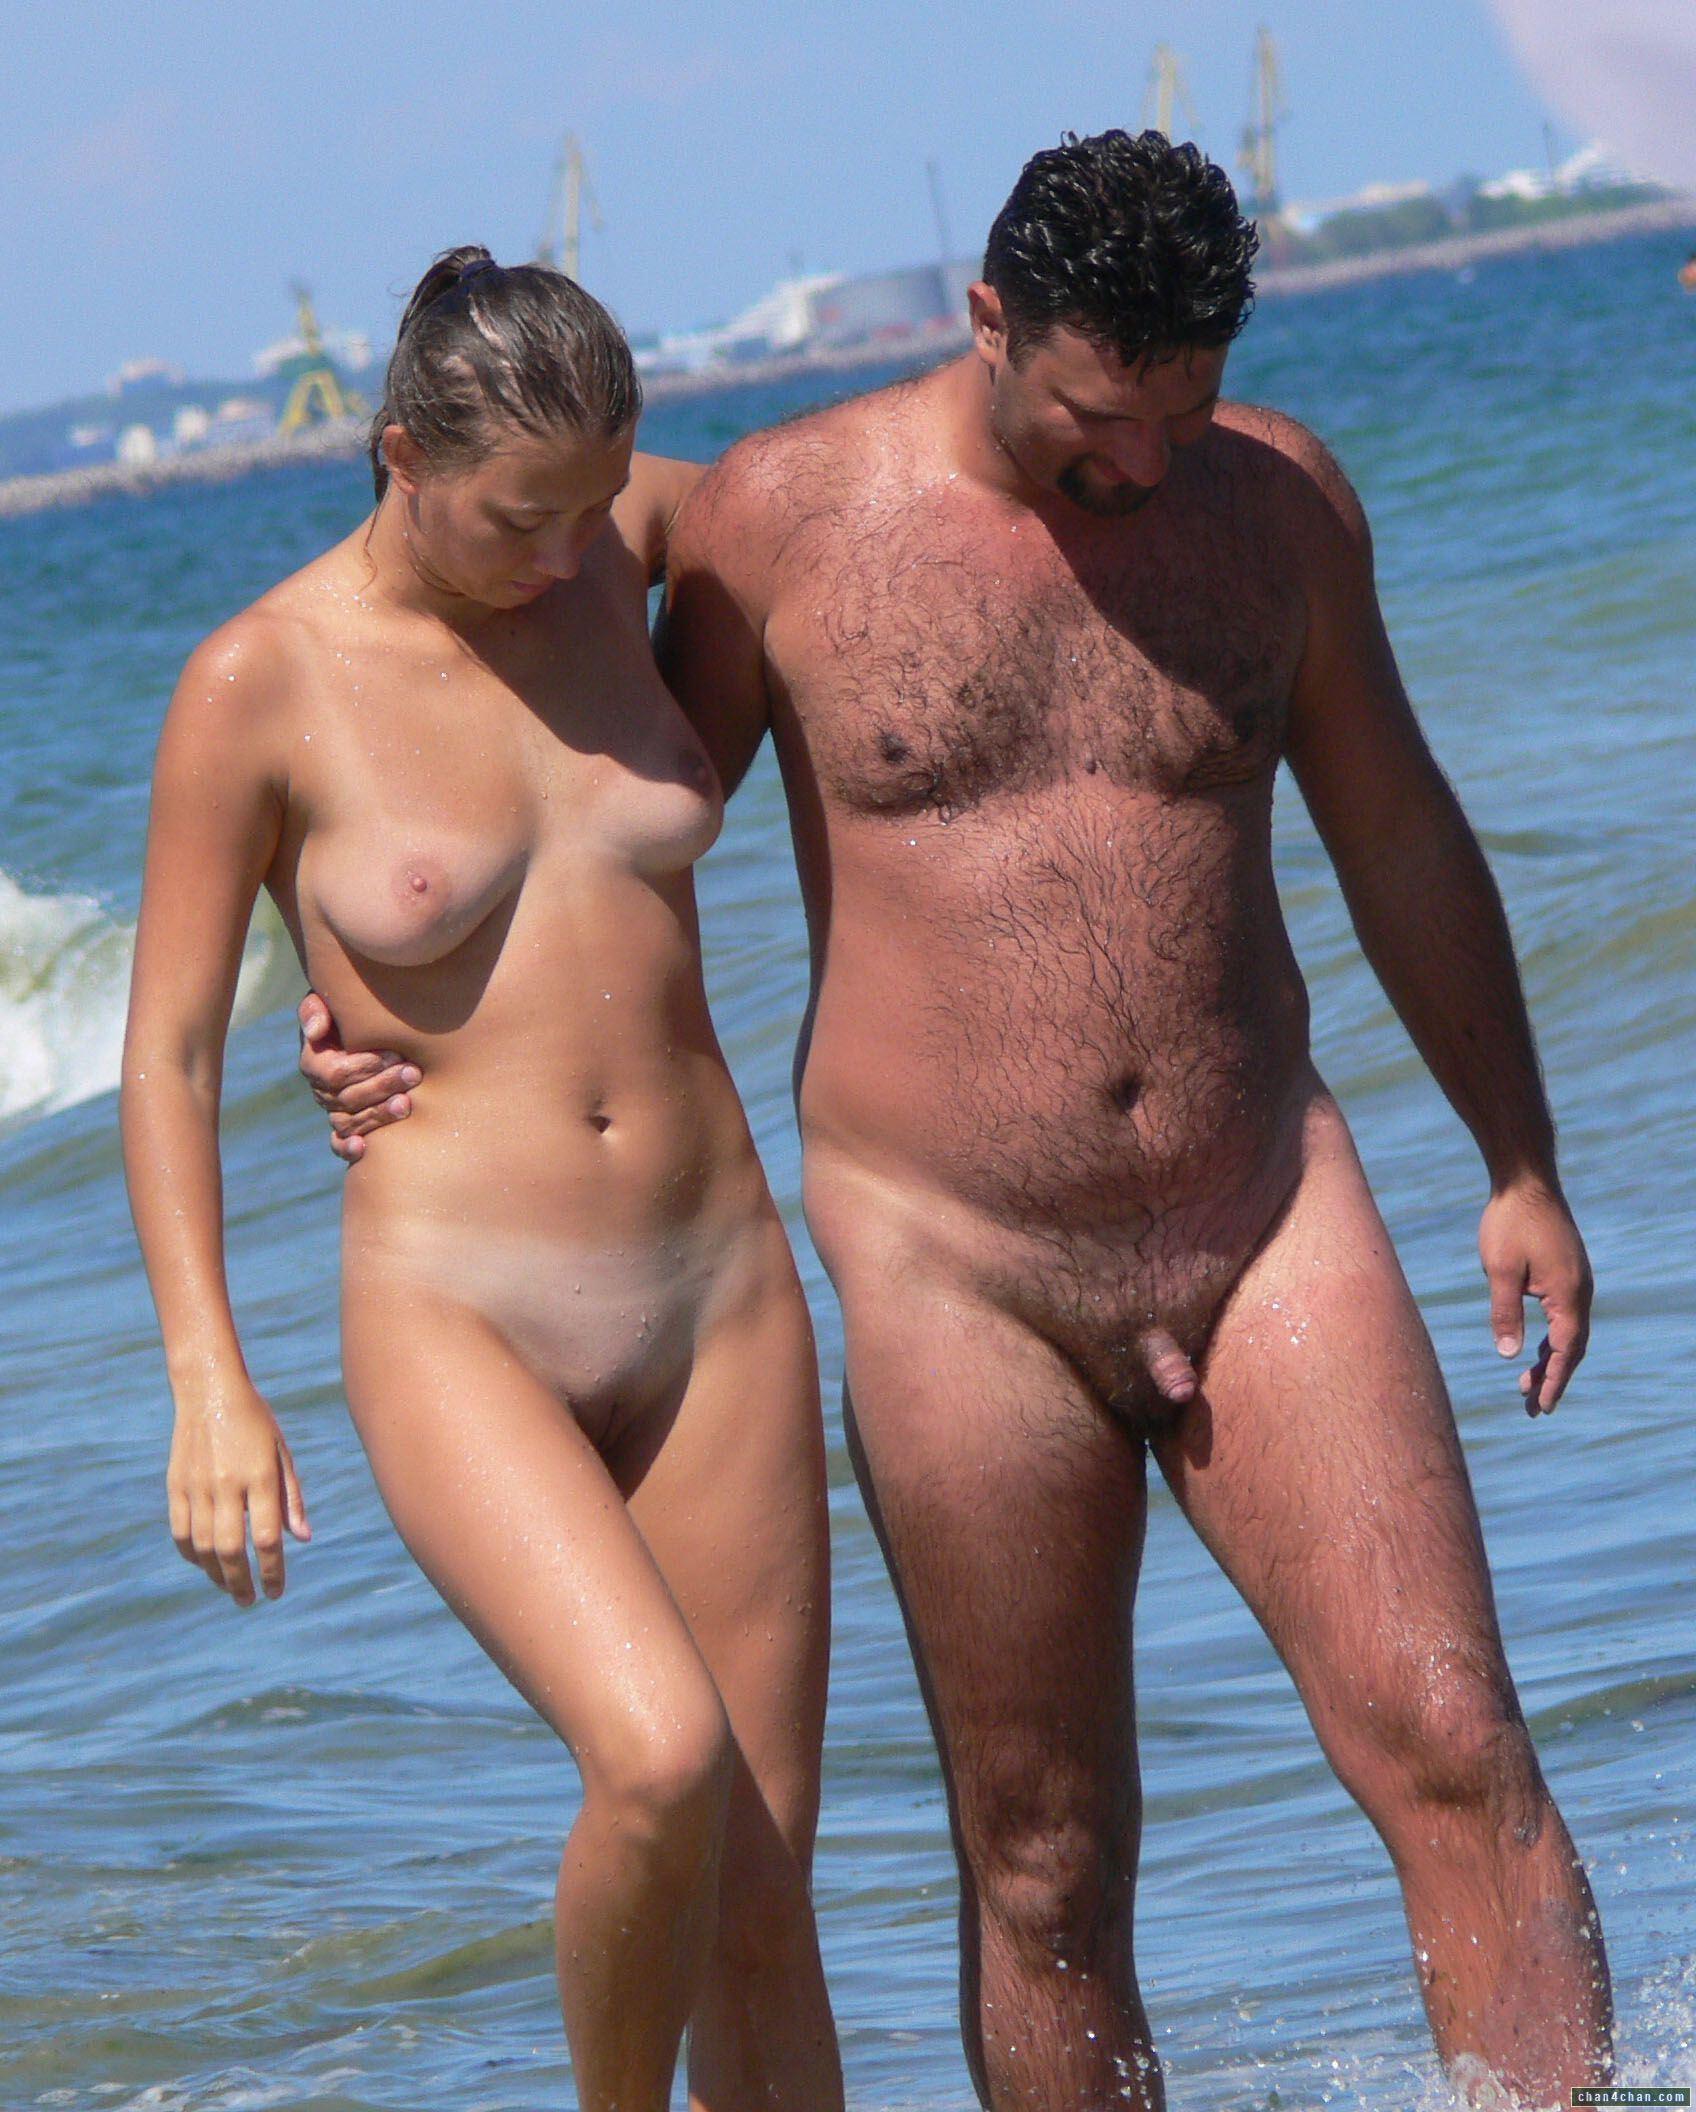 Small cock on nudist beach